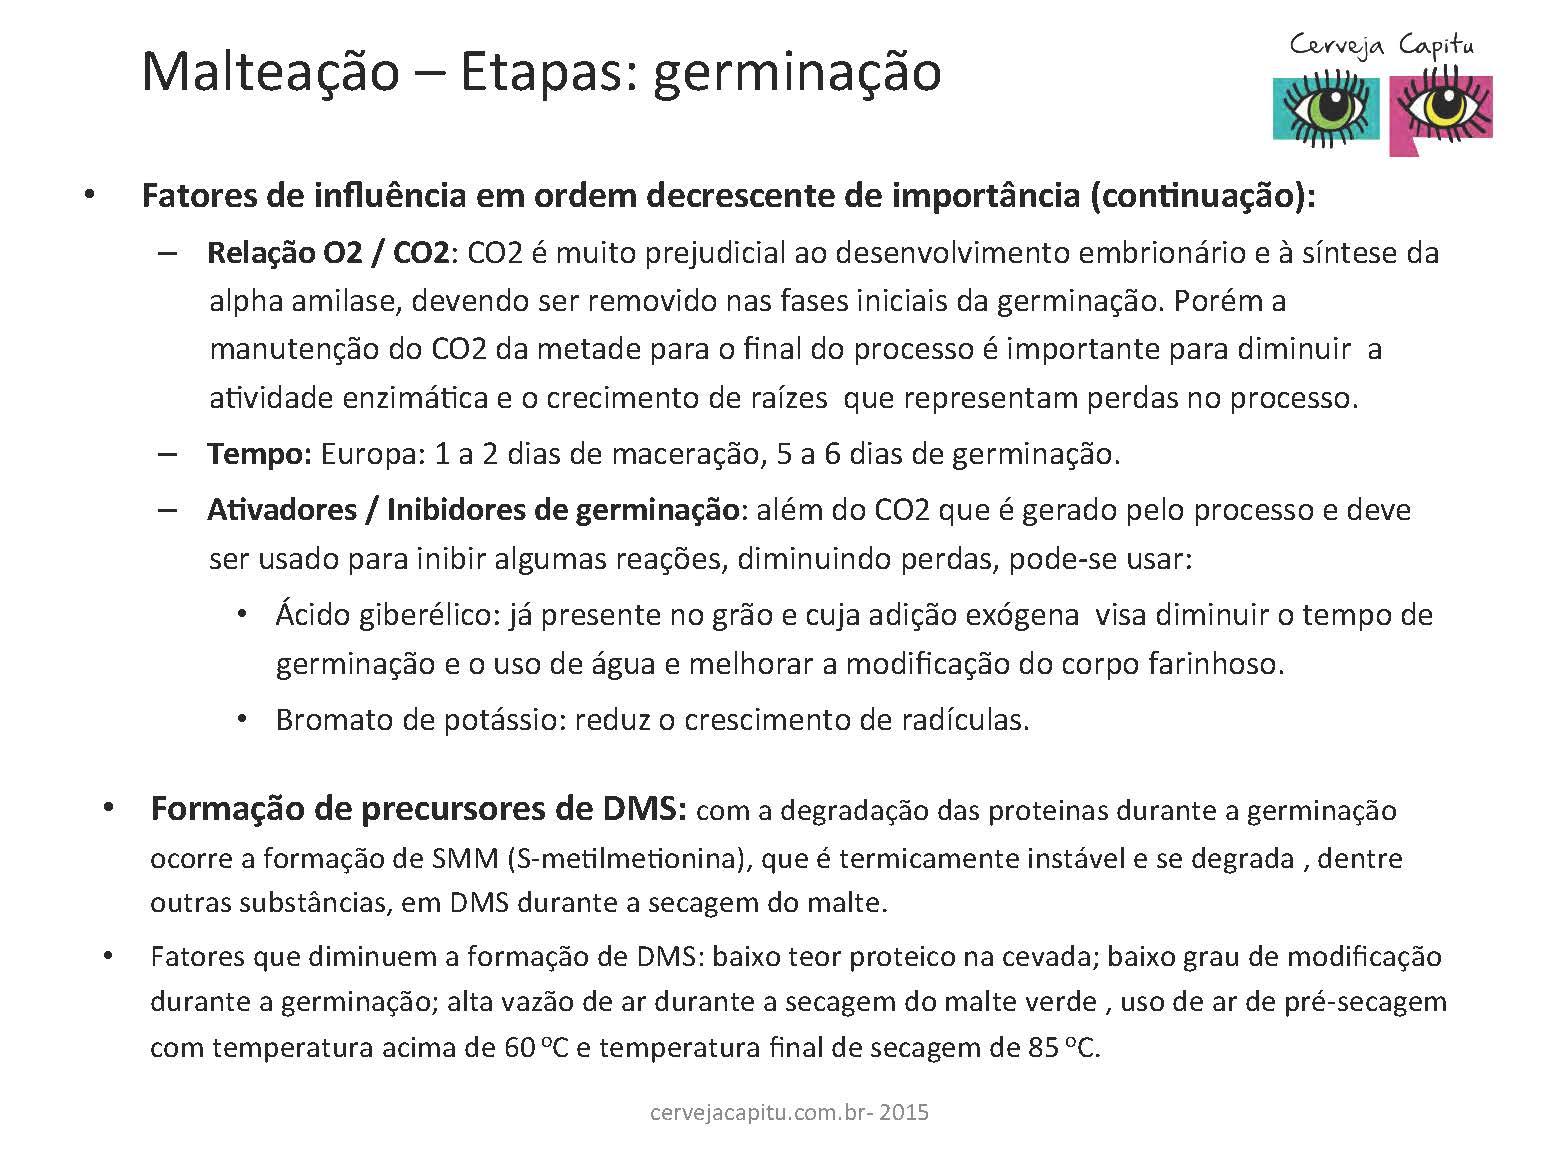 Princípios da Malteação_Capitu_SM_Page_07.jpg